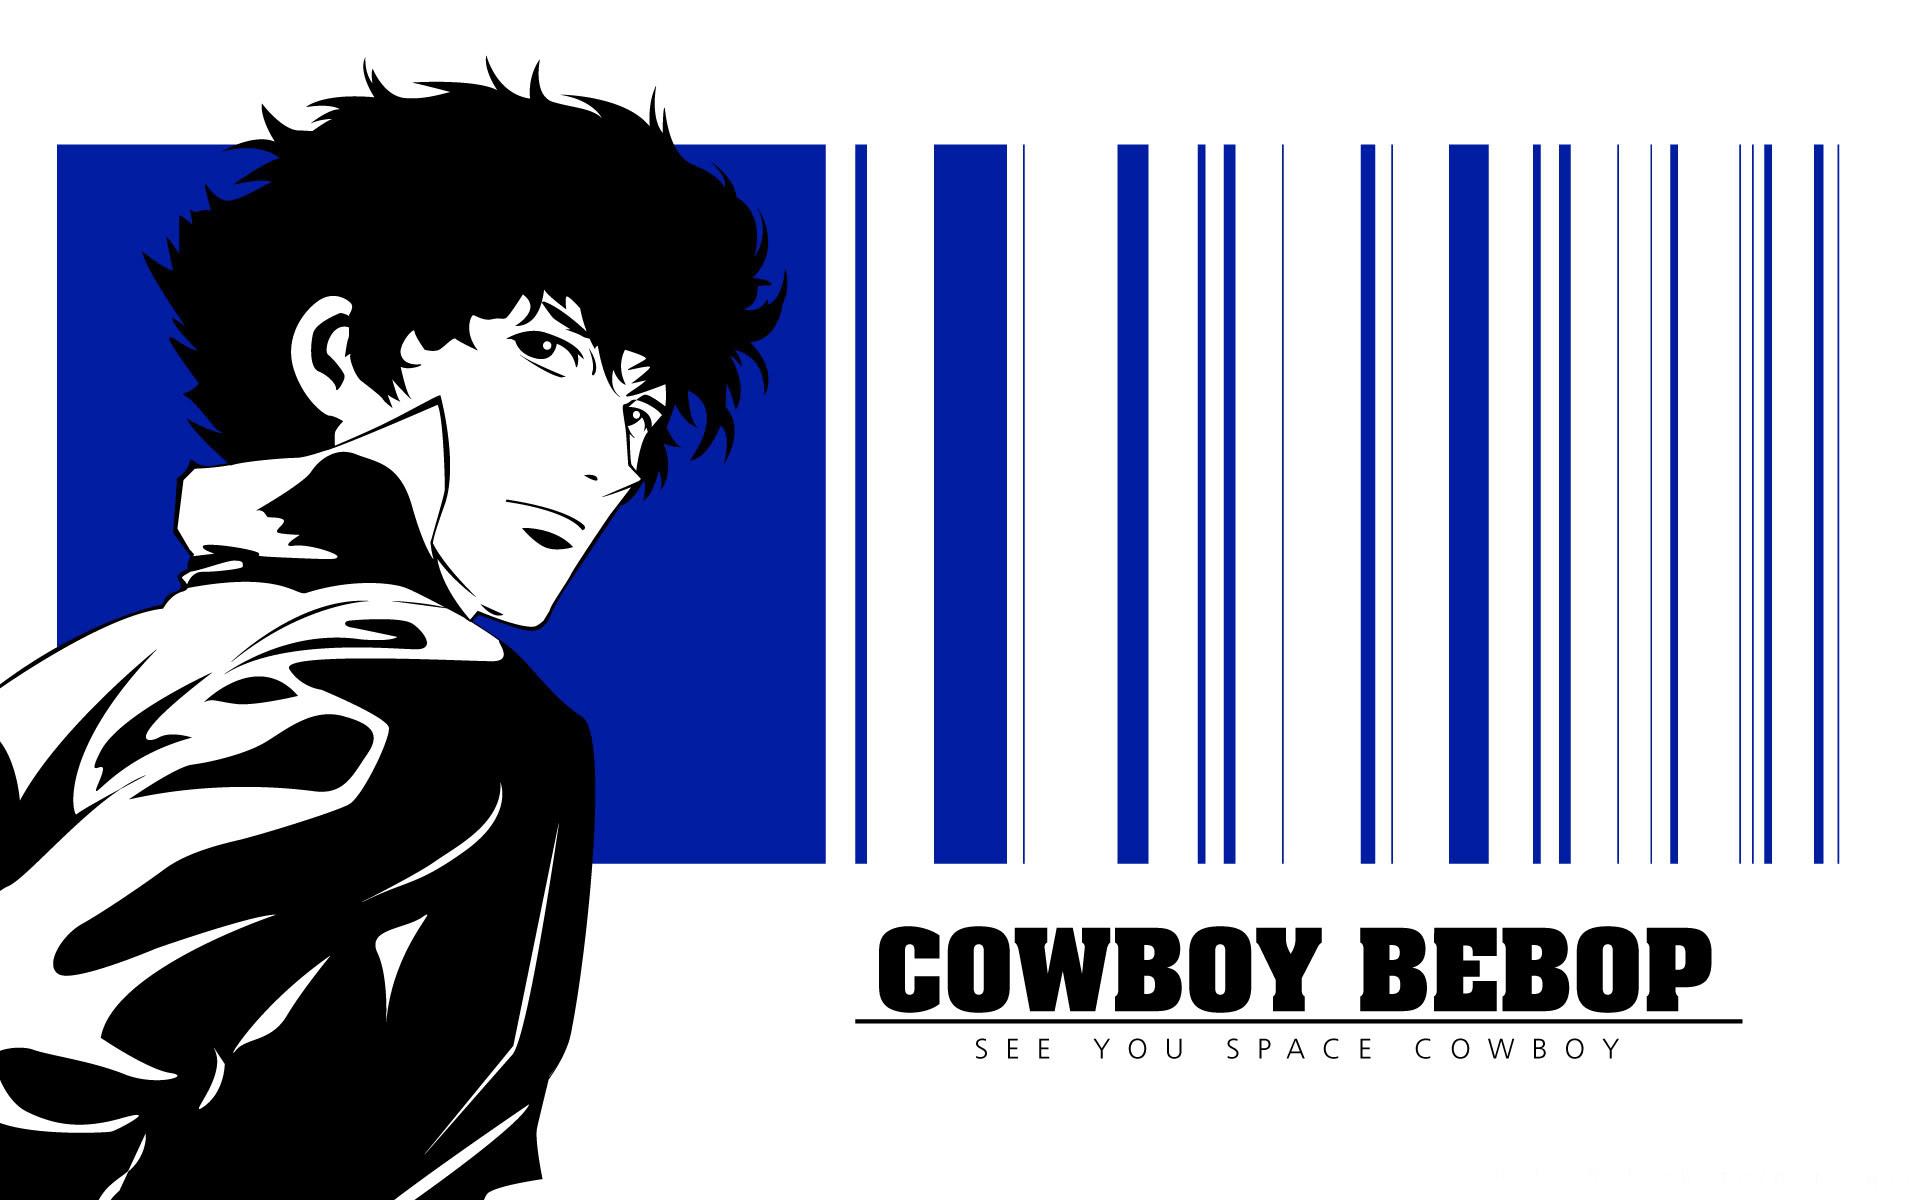 Spike Spiegel   Cowboy Bebop wallpaper 37587 1920x1200